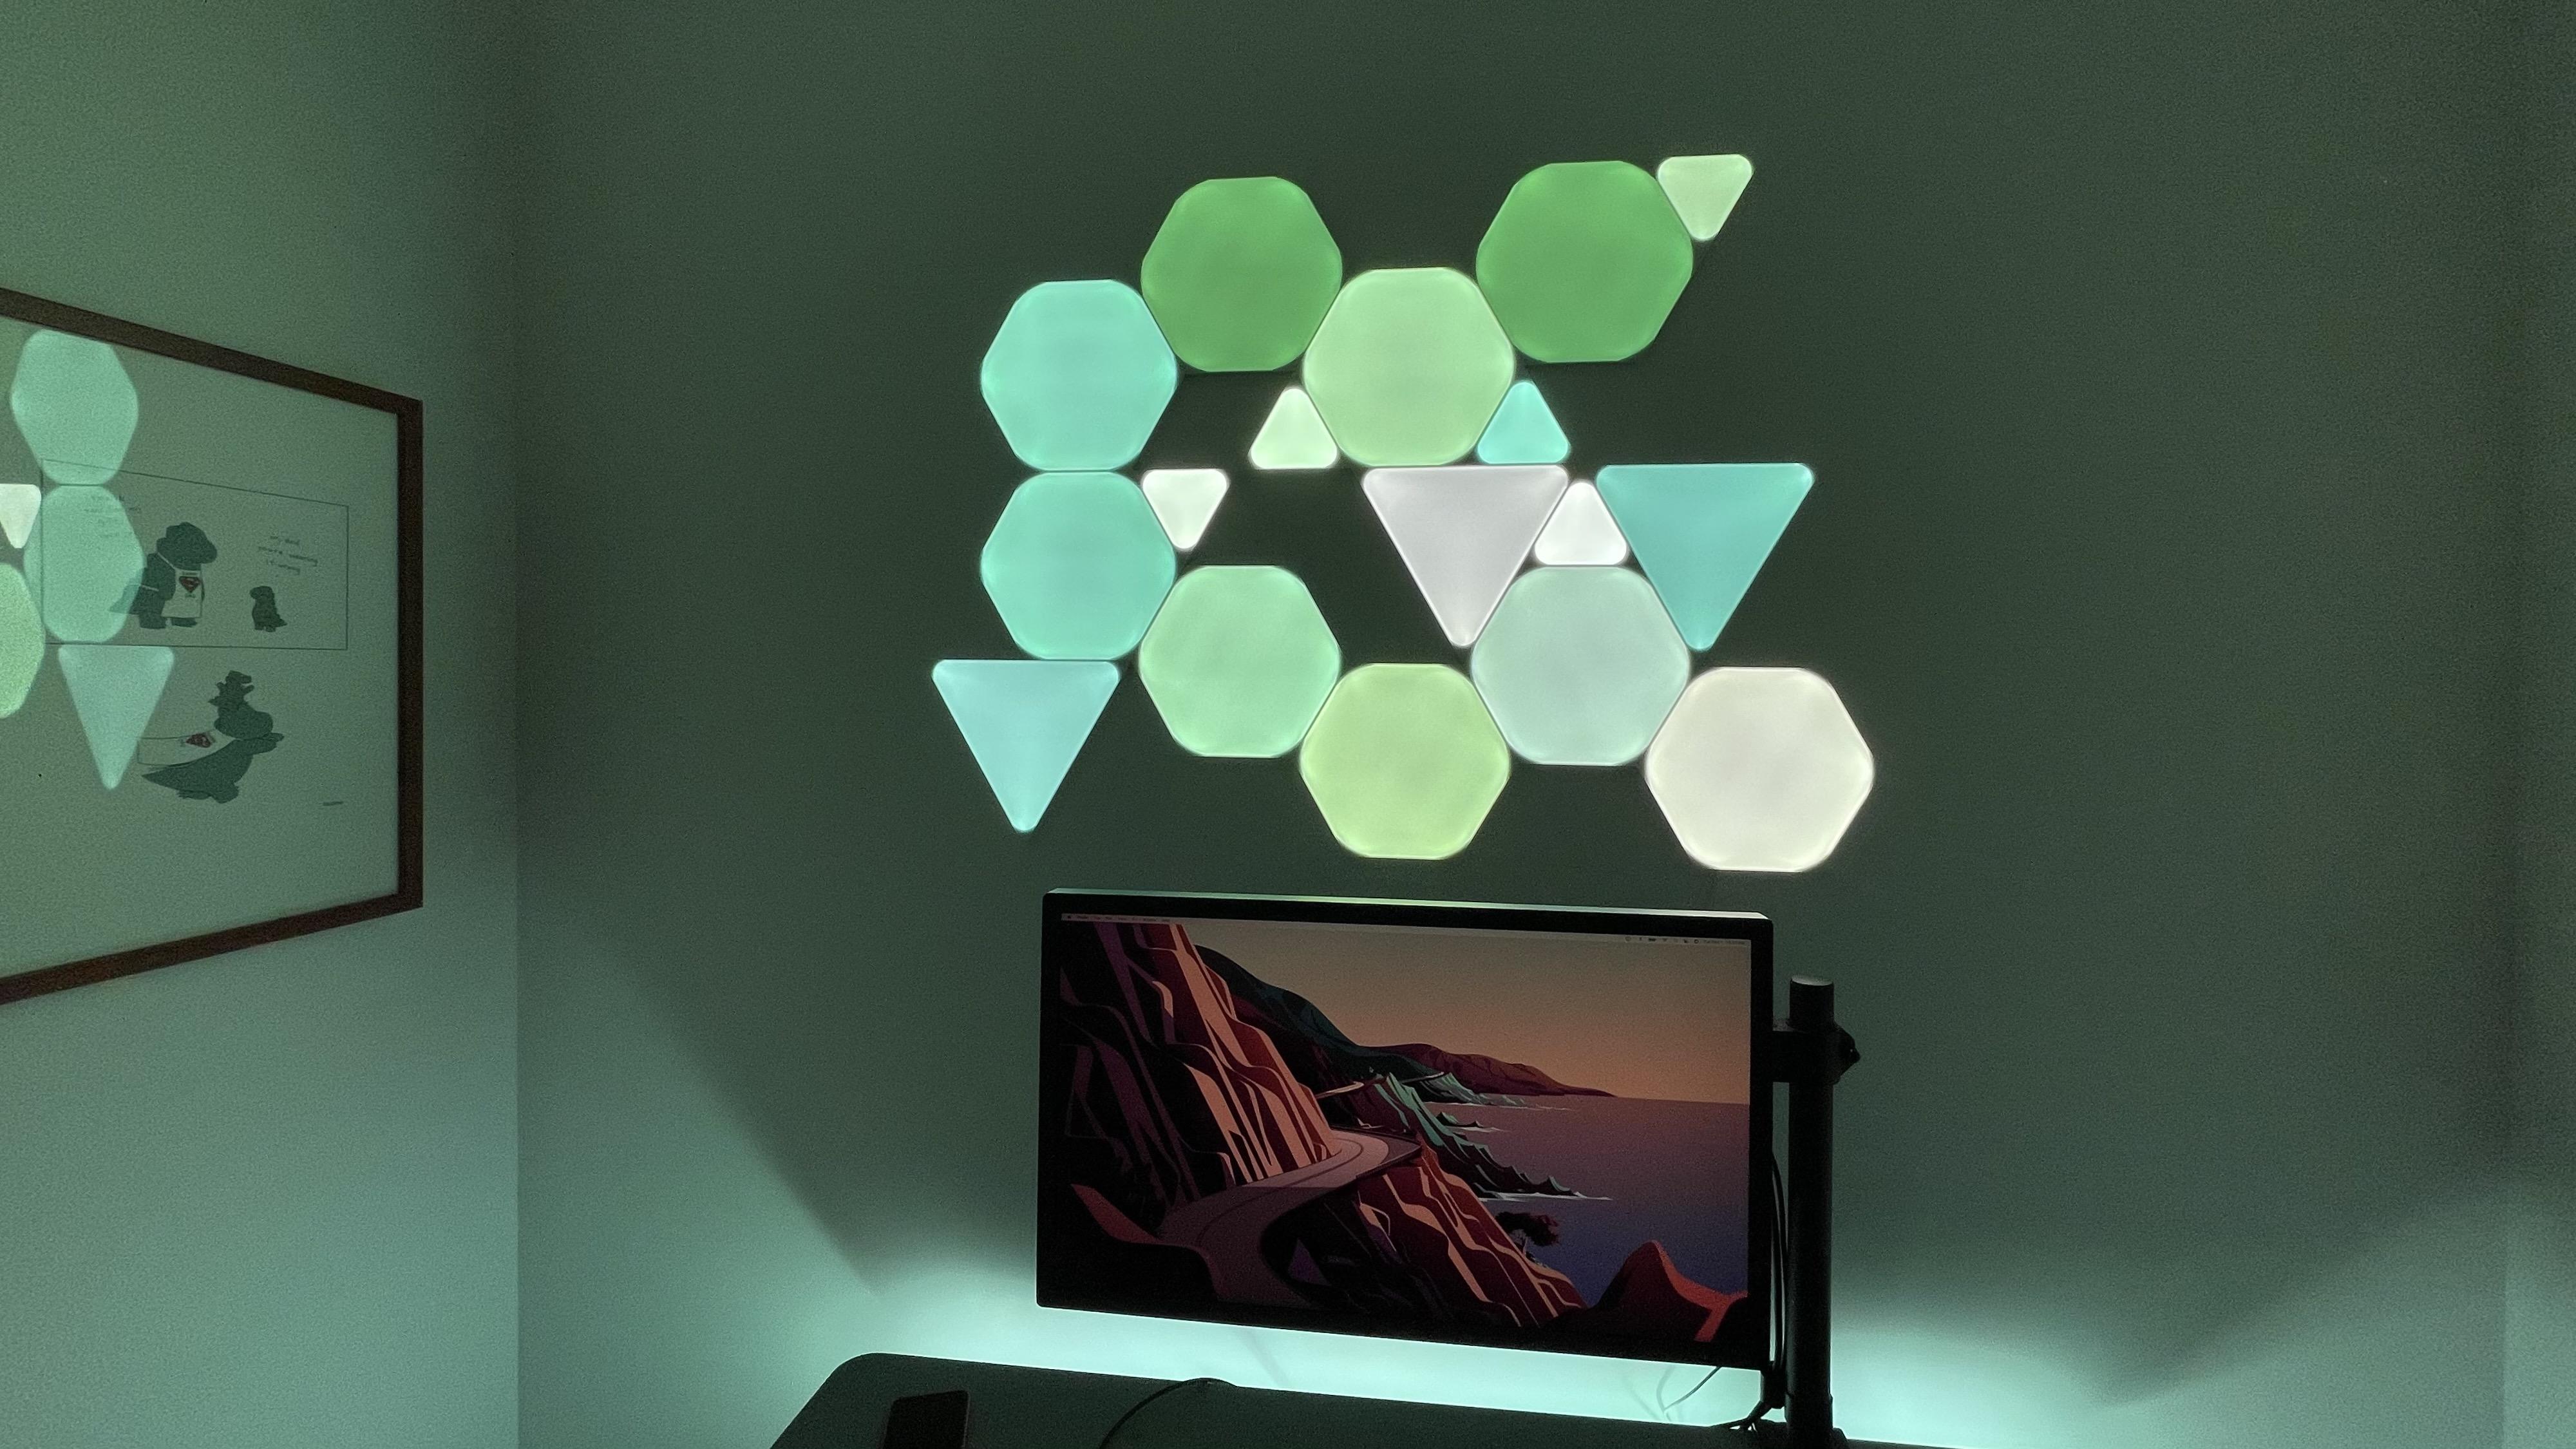 Review Nanoleaf Shapes HomeKit light panels - green